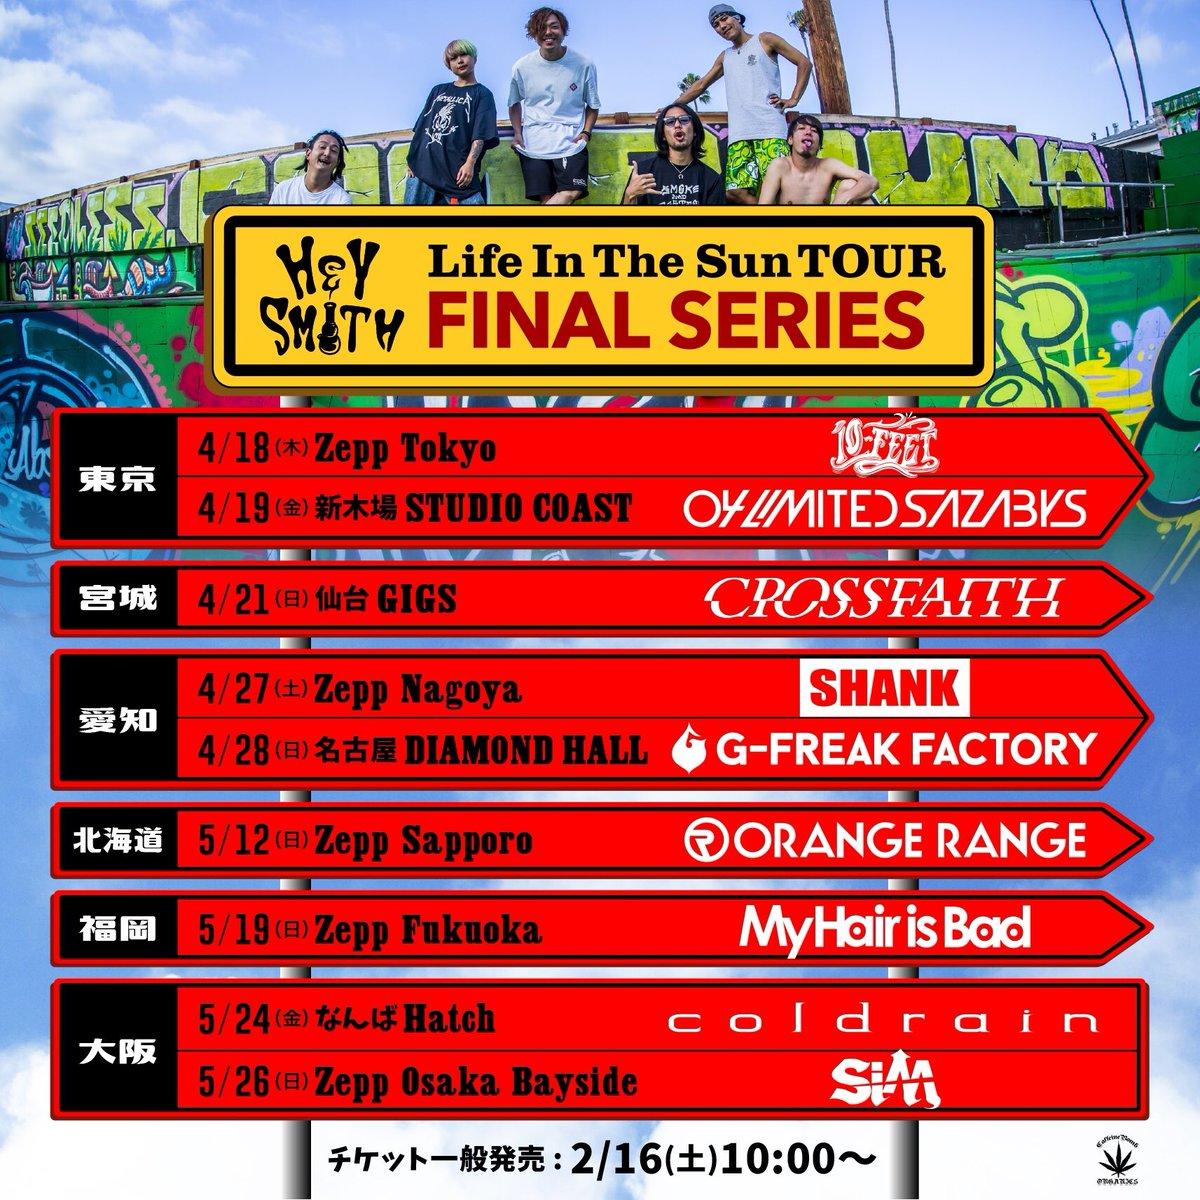 "HEY-SMITH""Life In The Sun TOUR FINAL SERIES""に出演決定!! 5/24(金)なんばHatch公演に出演!!  #coldrain"